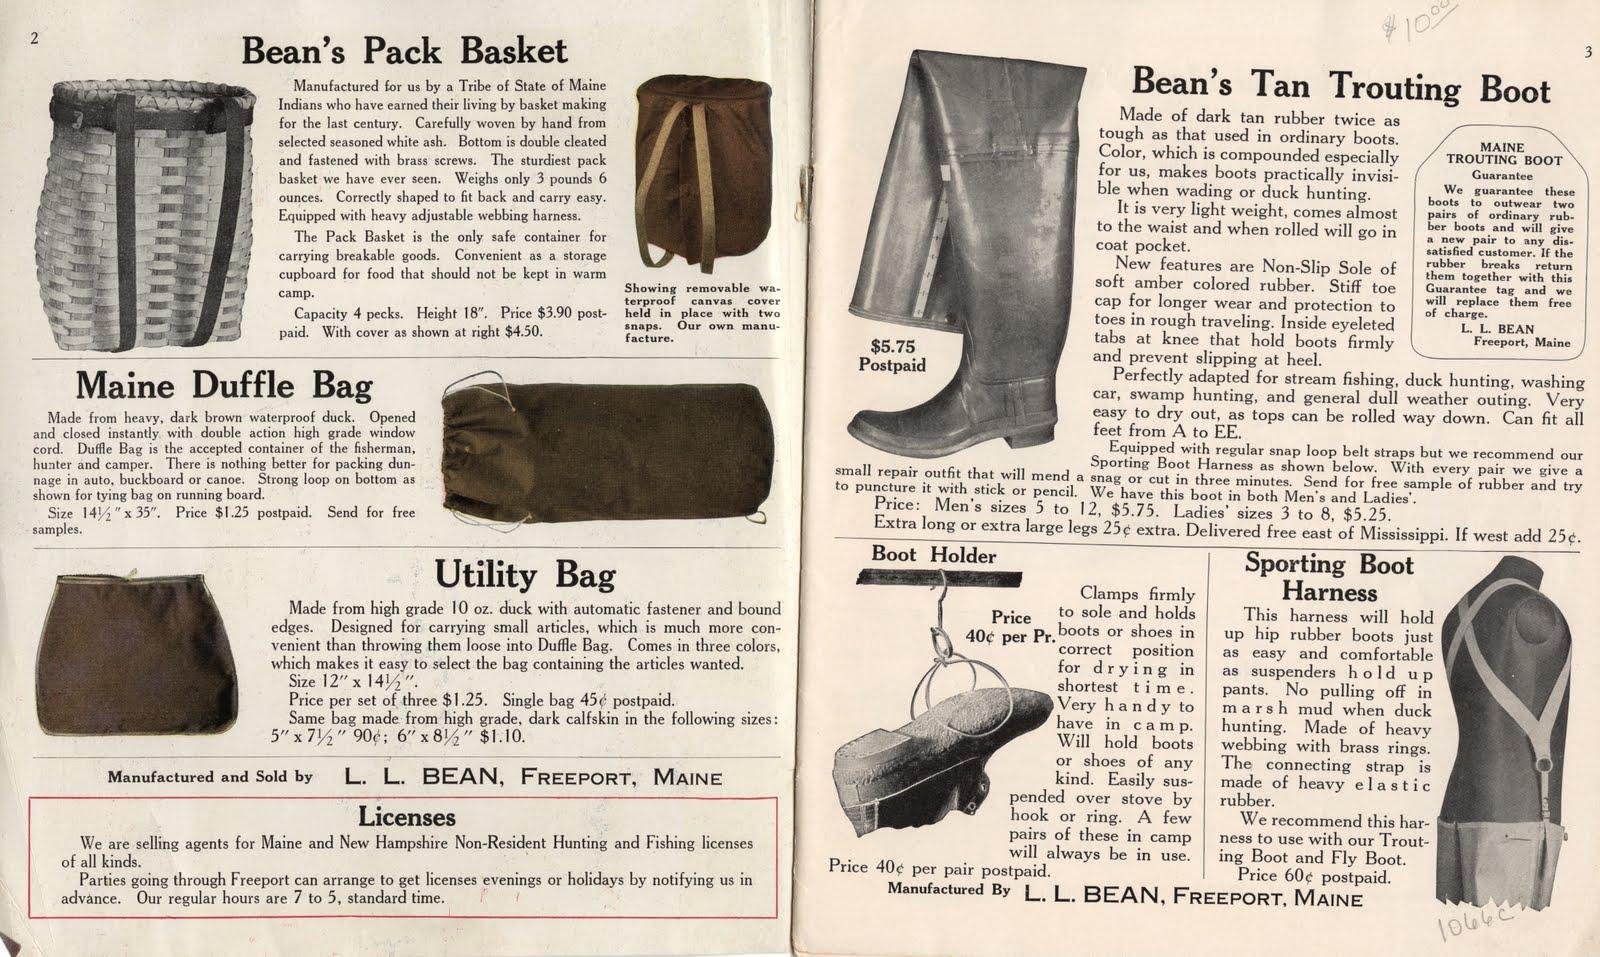 L l bean order form - Shopping From 1933 Ll Bean